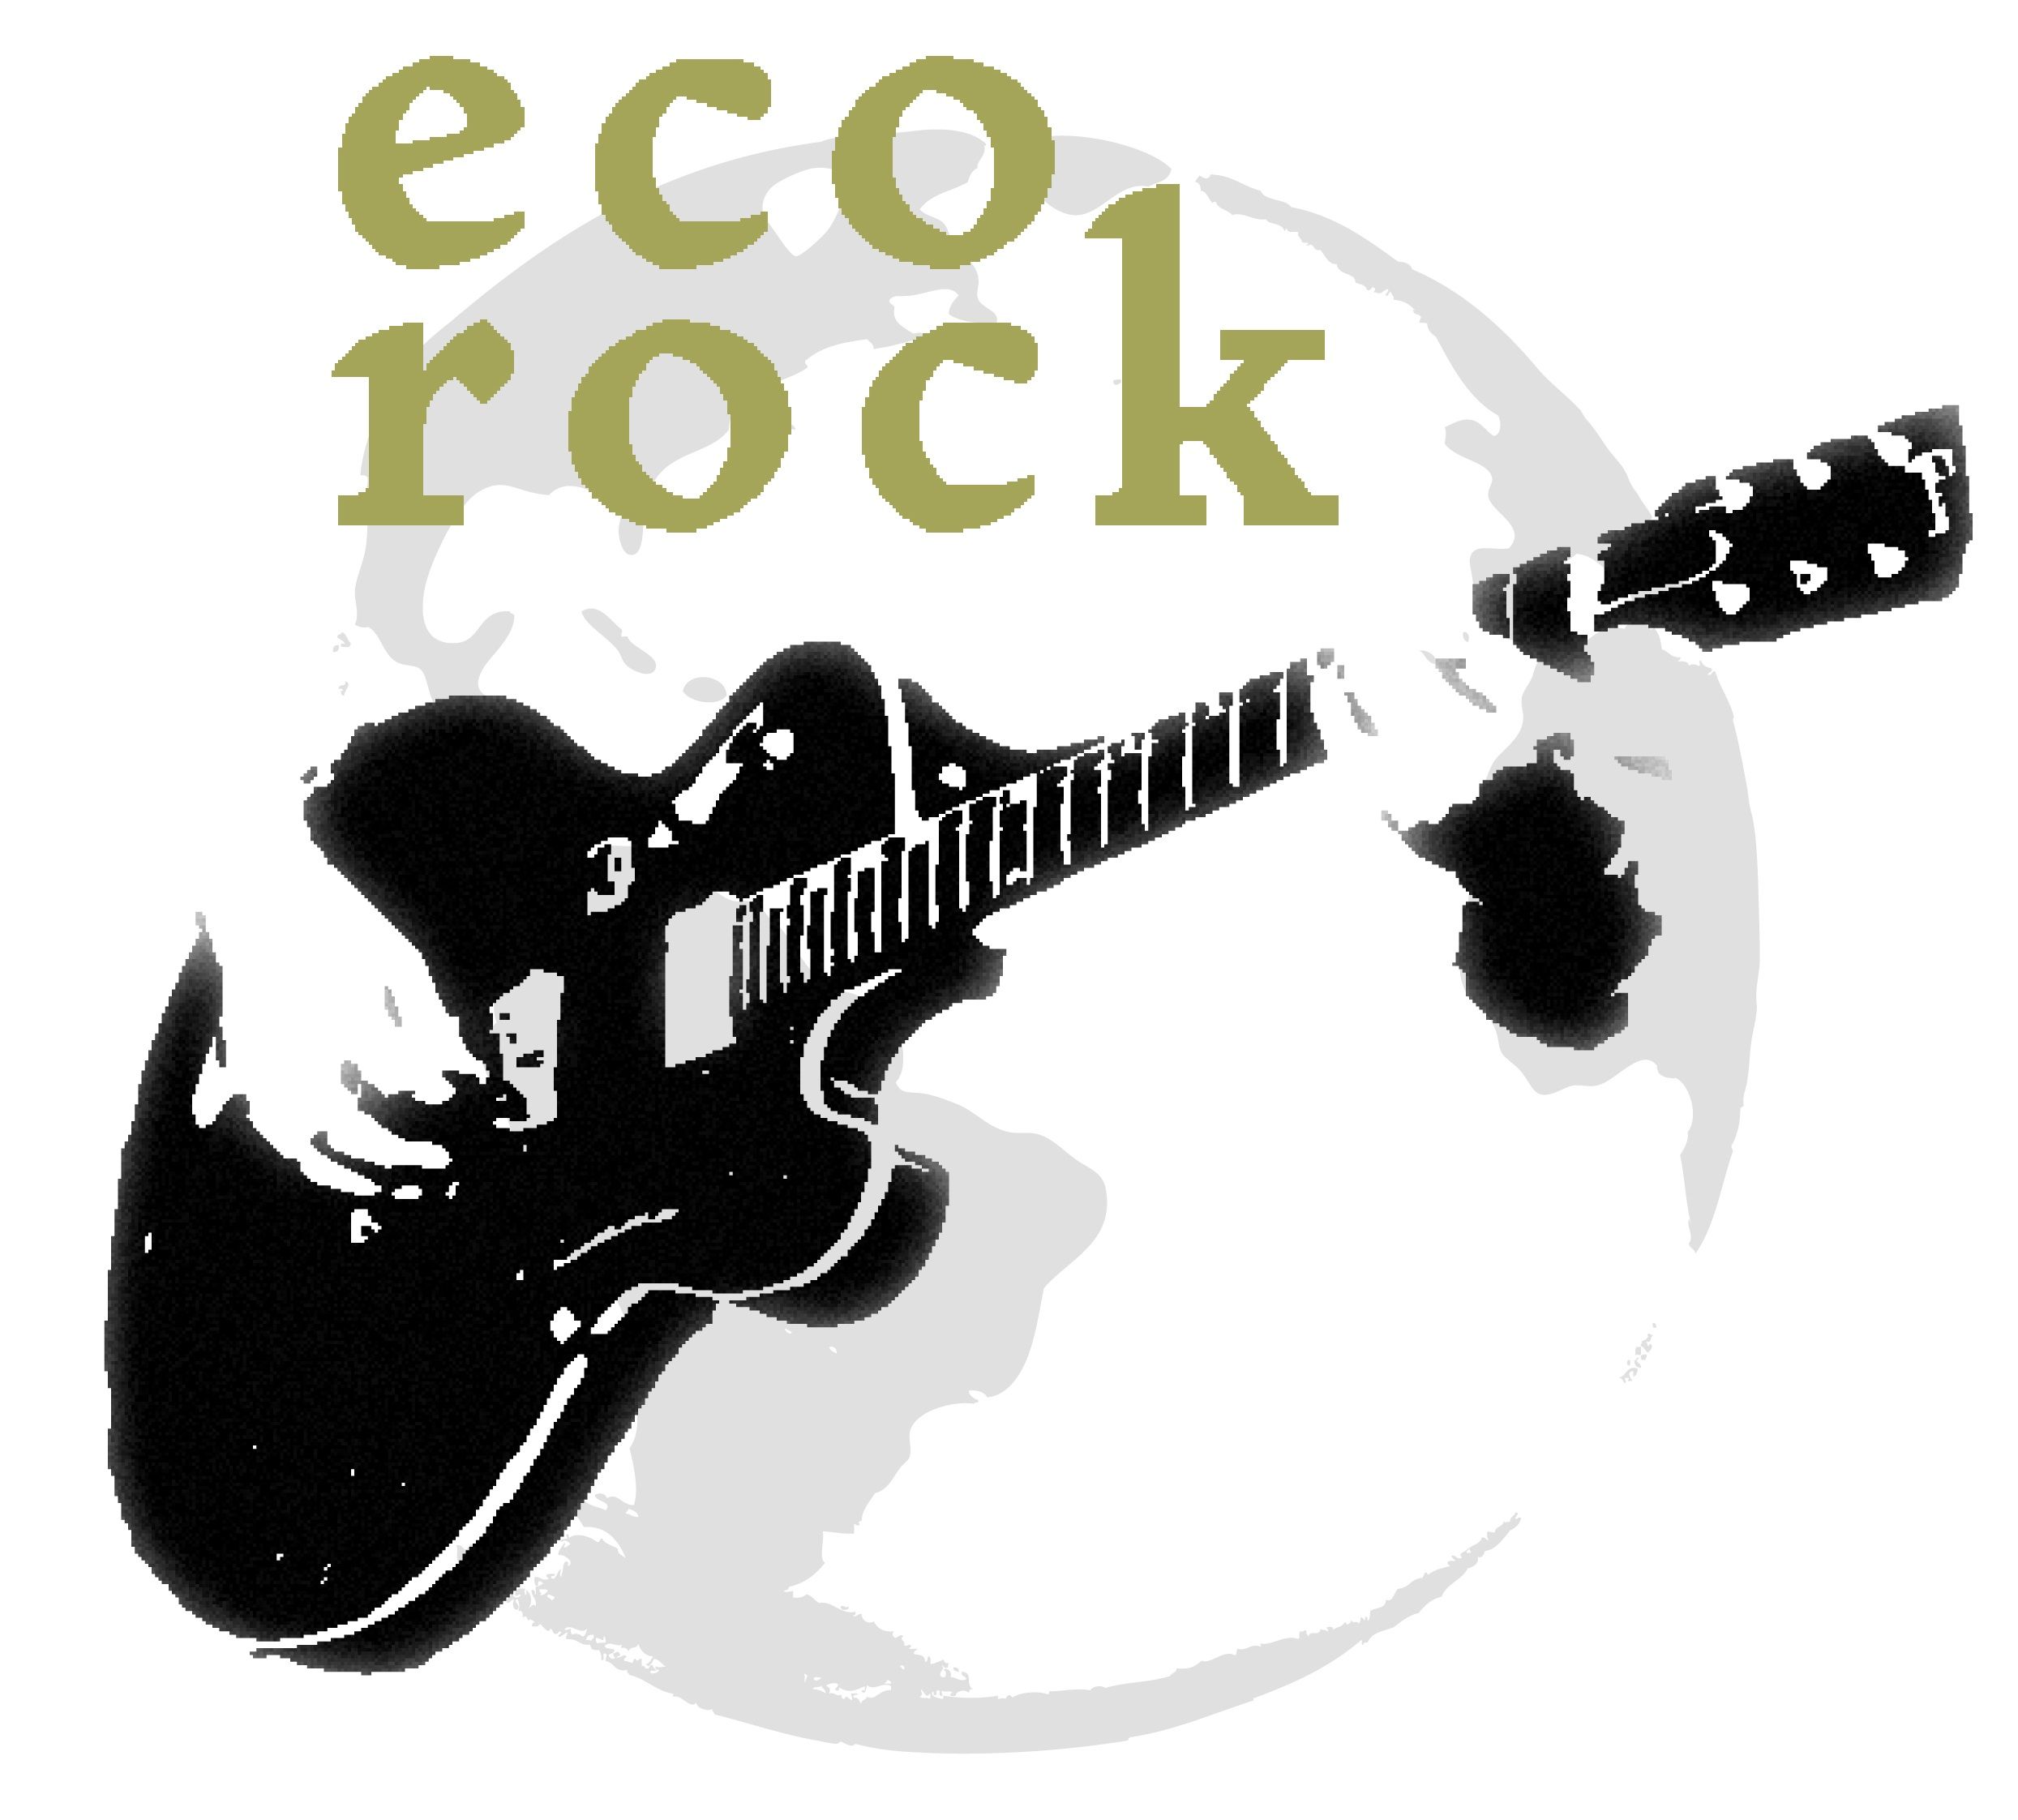 Eco_rock_logo.jpg